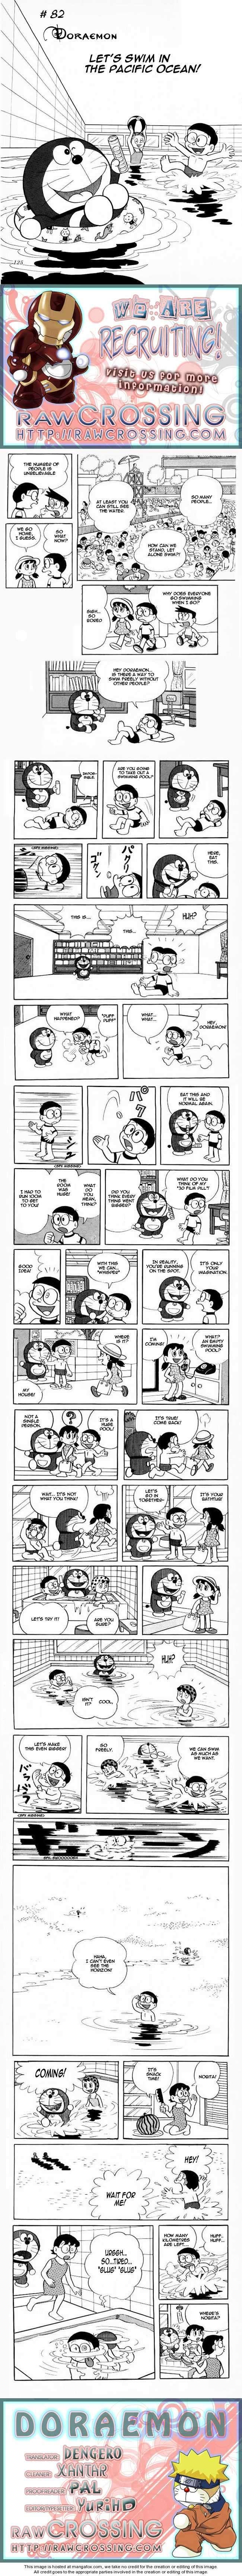 Doraemon 82 Page 1